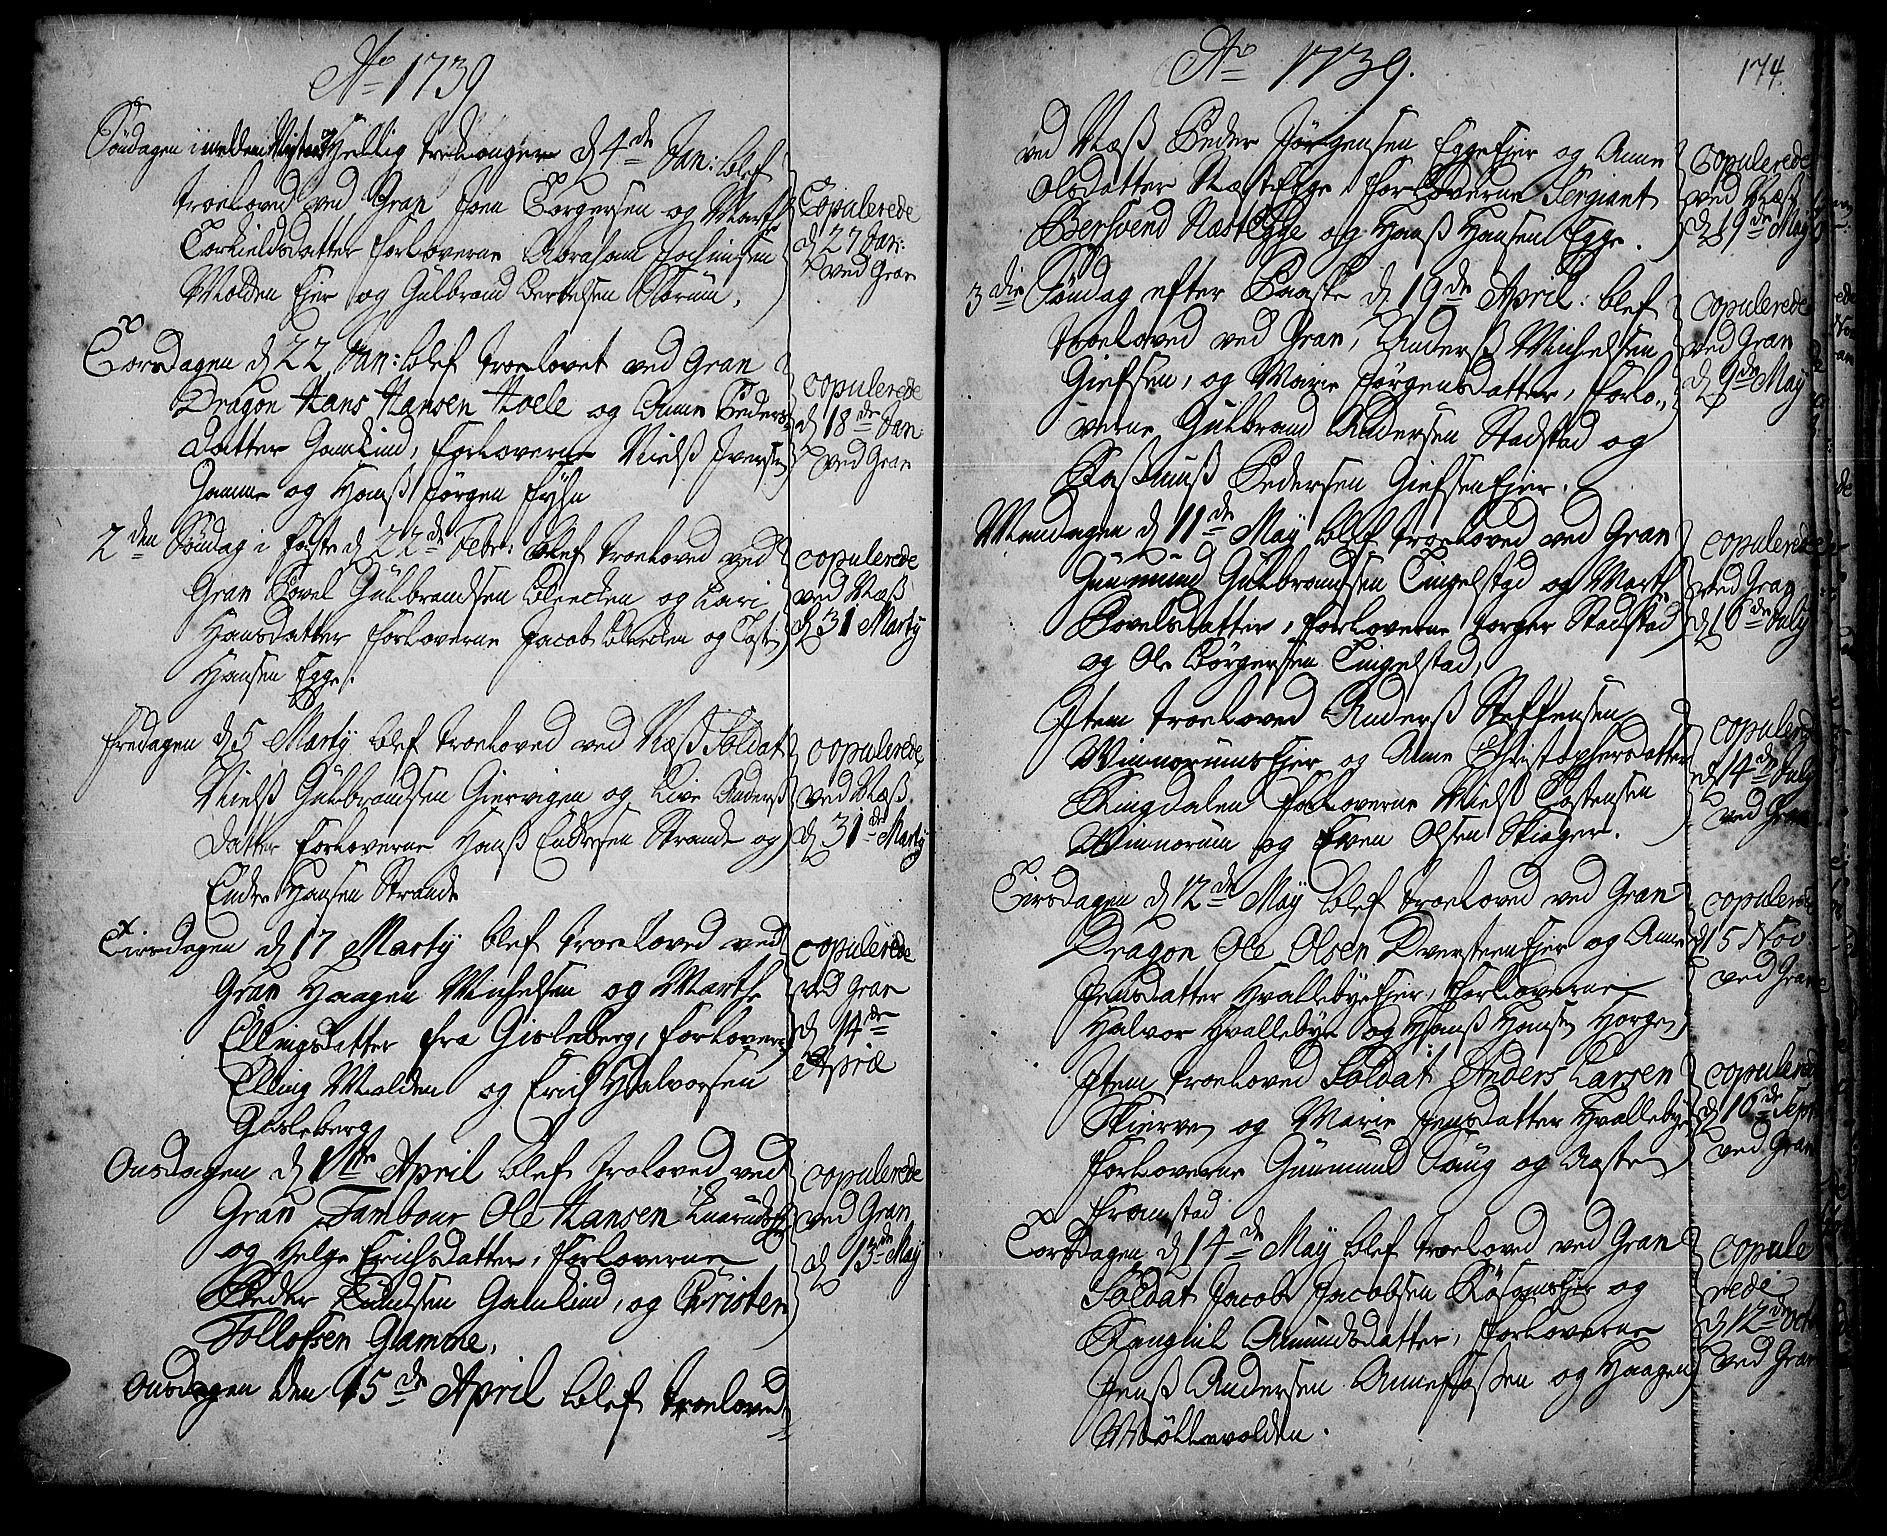 SAH, Gran prestekontor, Ministerialbok nr. 2, 1732-1744, s. 174